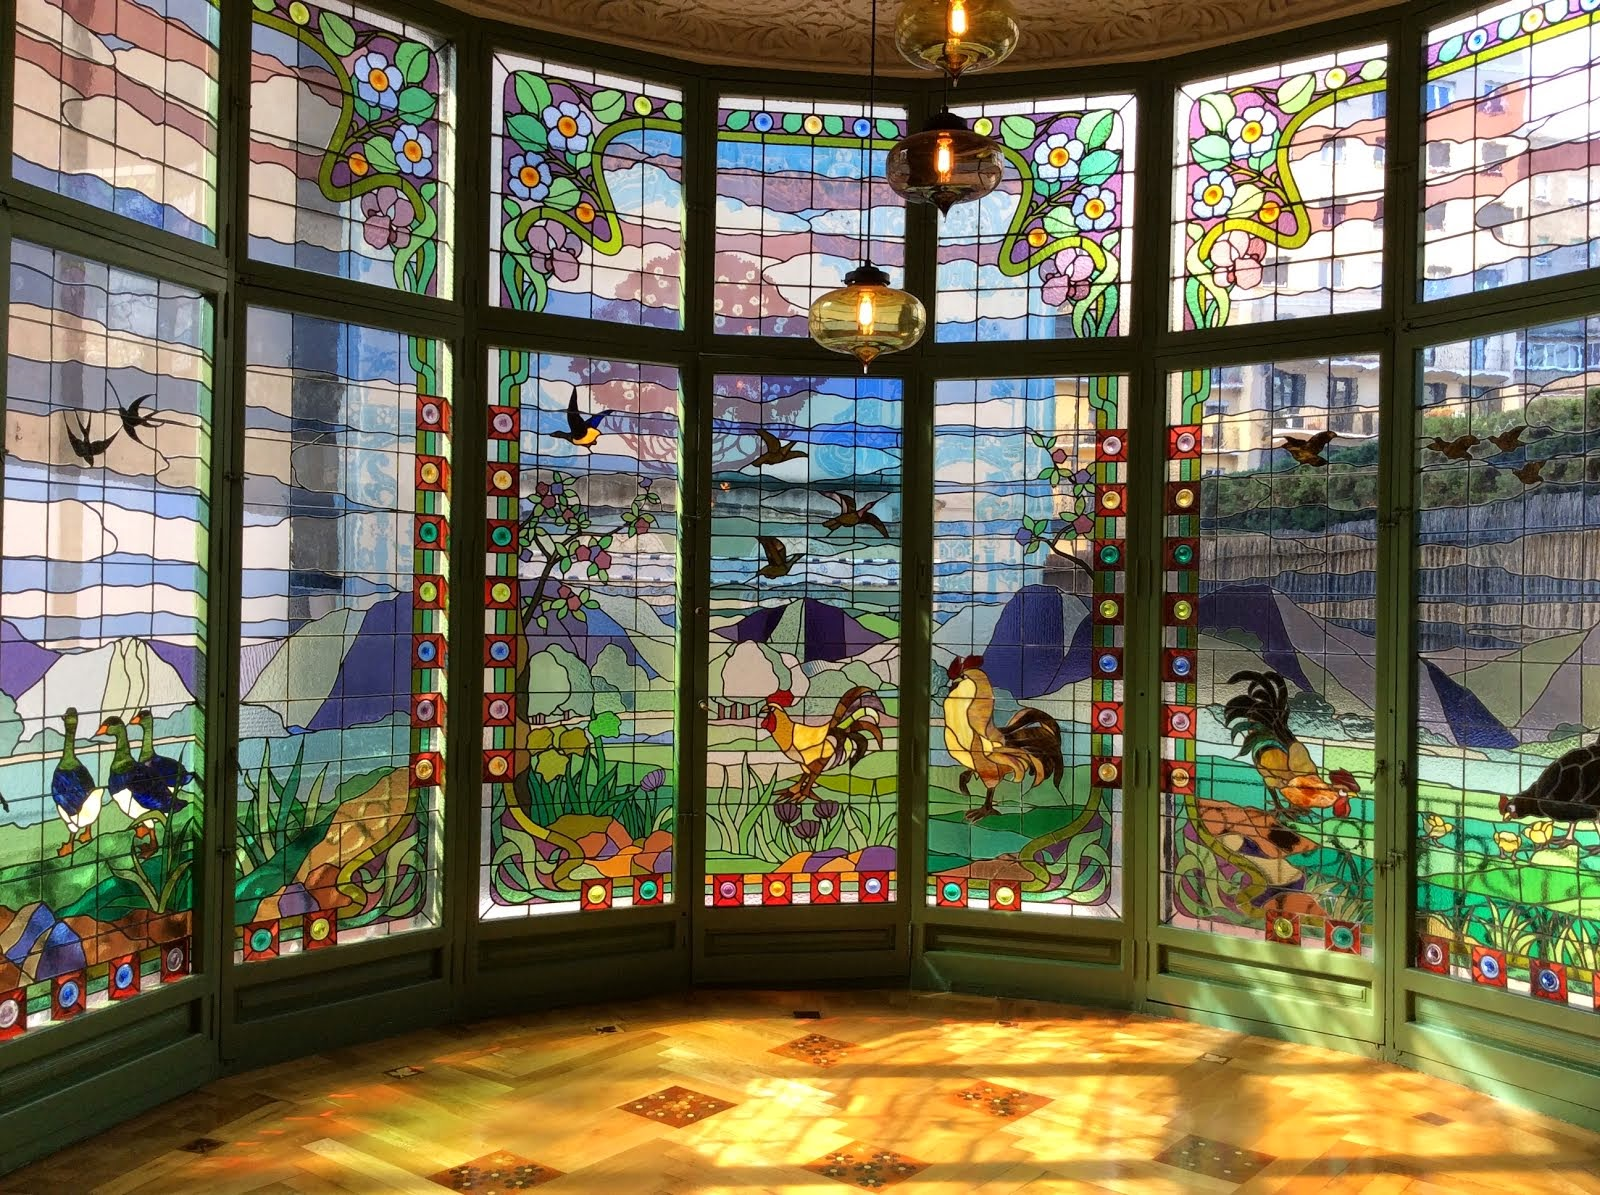 Casa Lleo Morera, Barcelona. Stain glass windows in dining room.